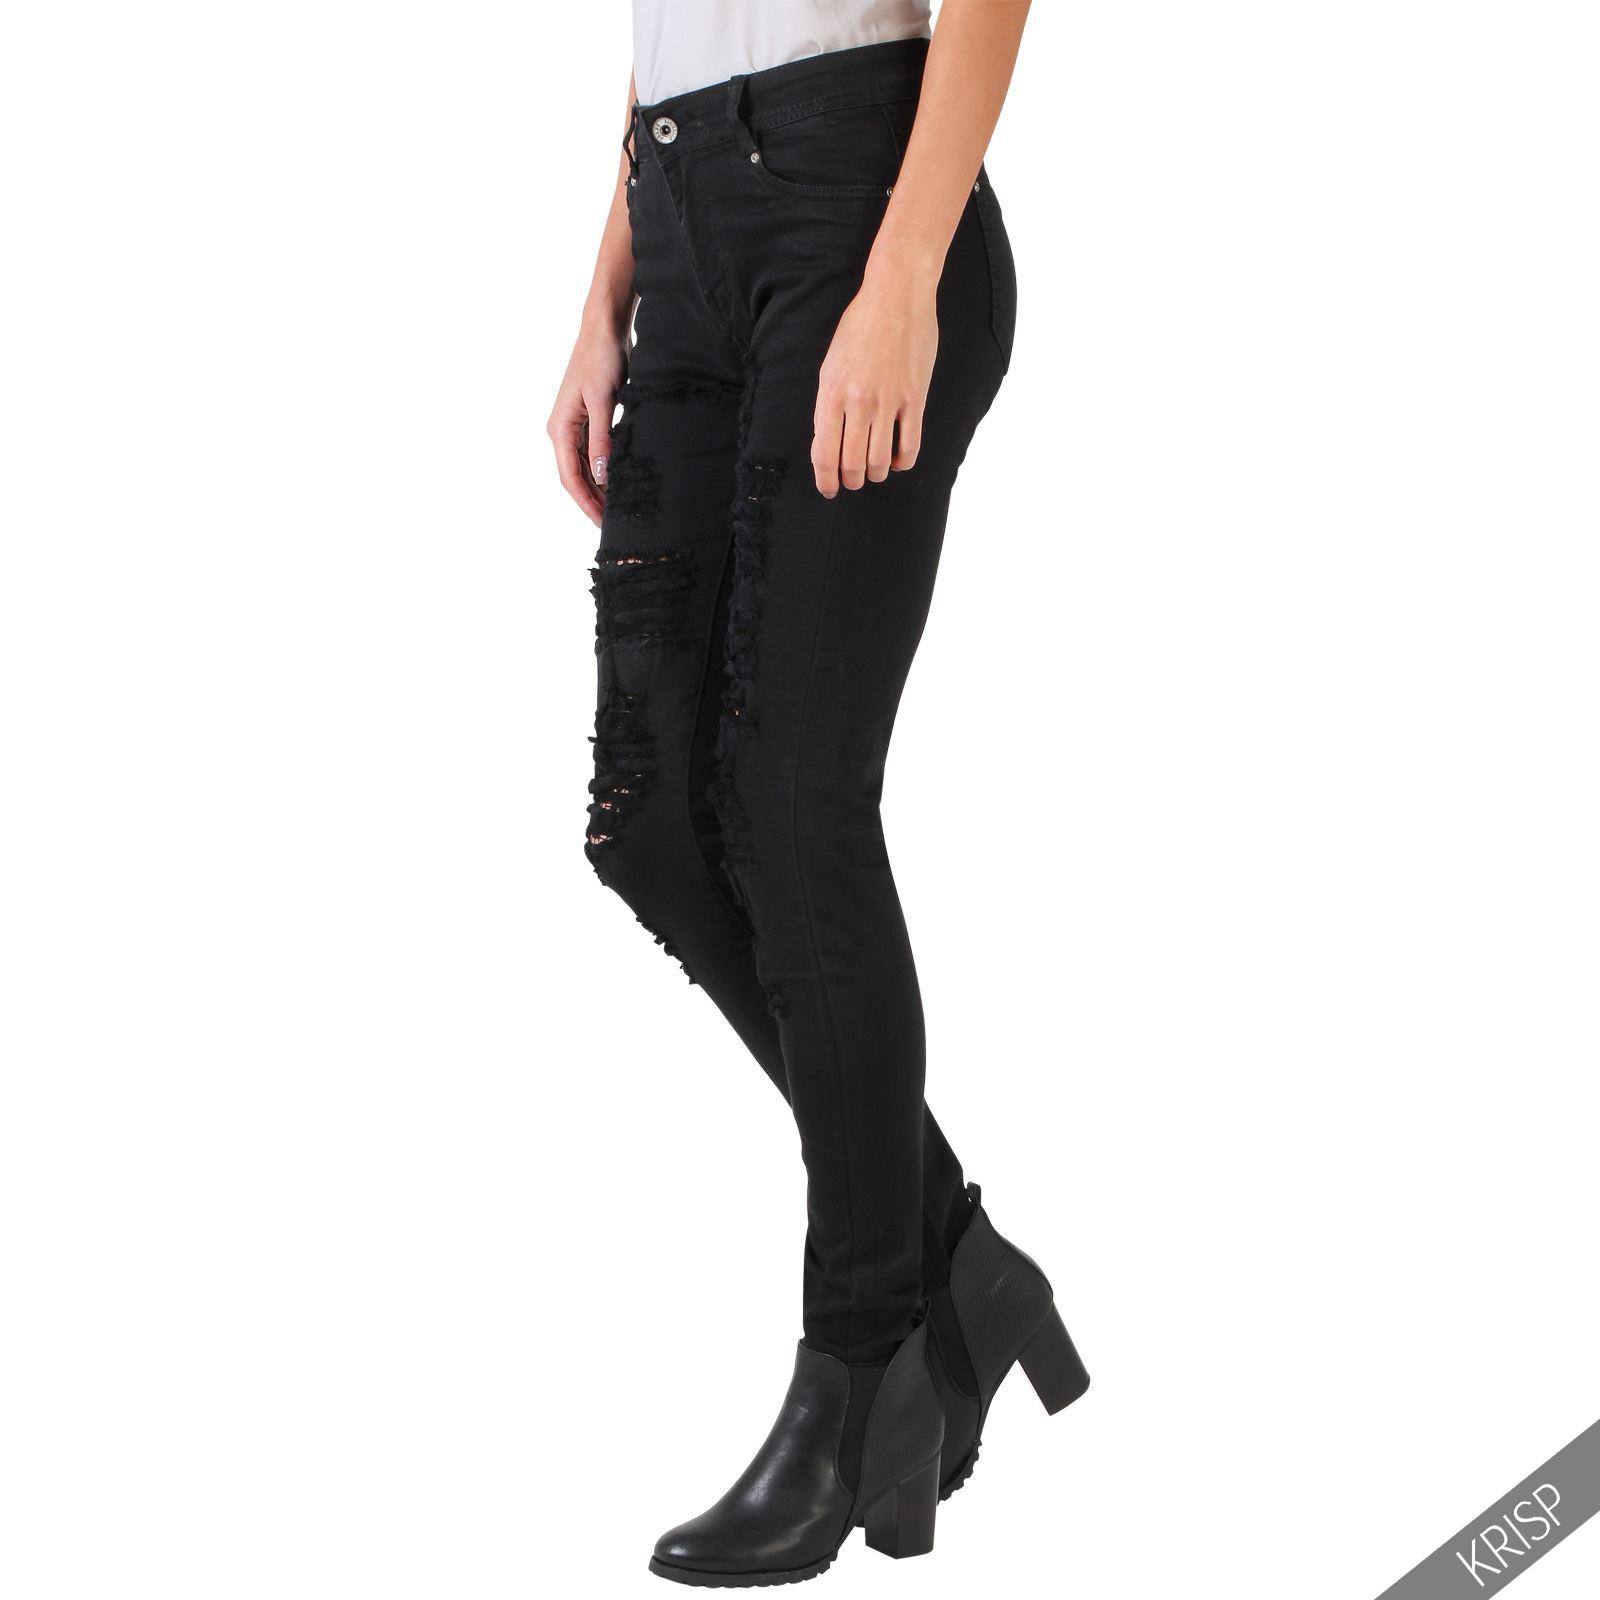 Amazing Ripped Jeans Skinny Jeans Women Slim Fashion Denim Long Pencil Pants